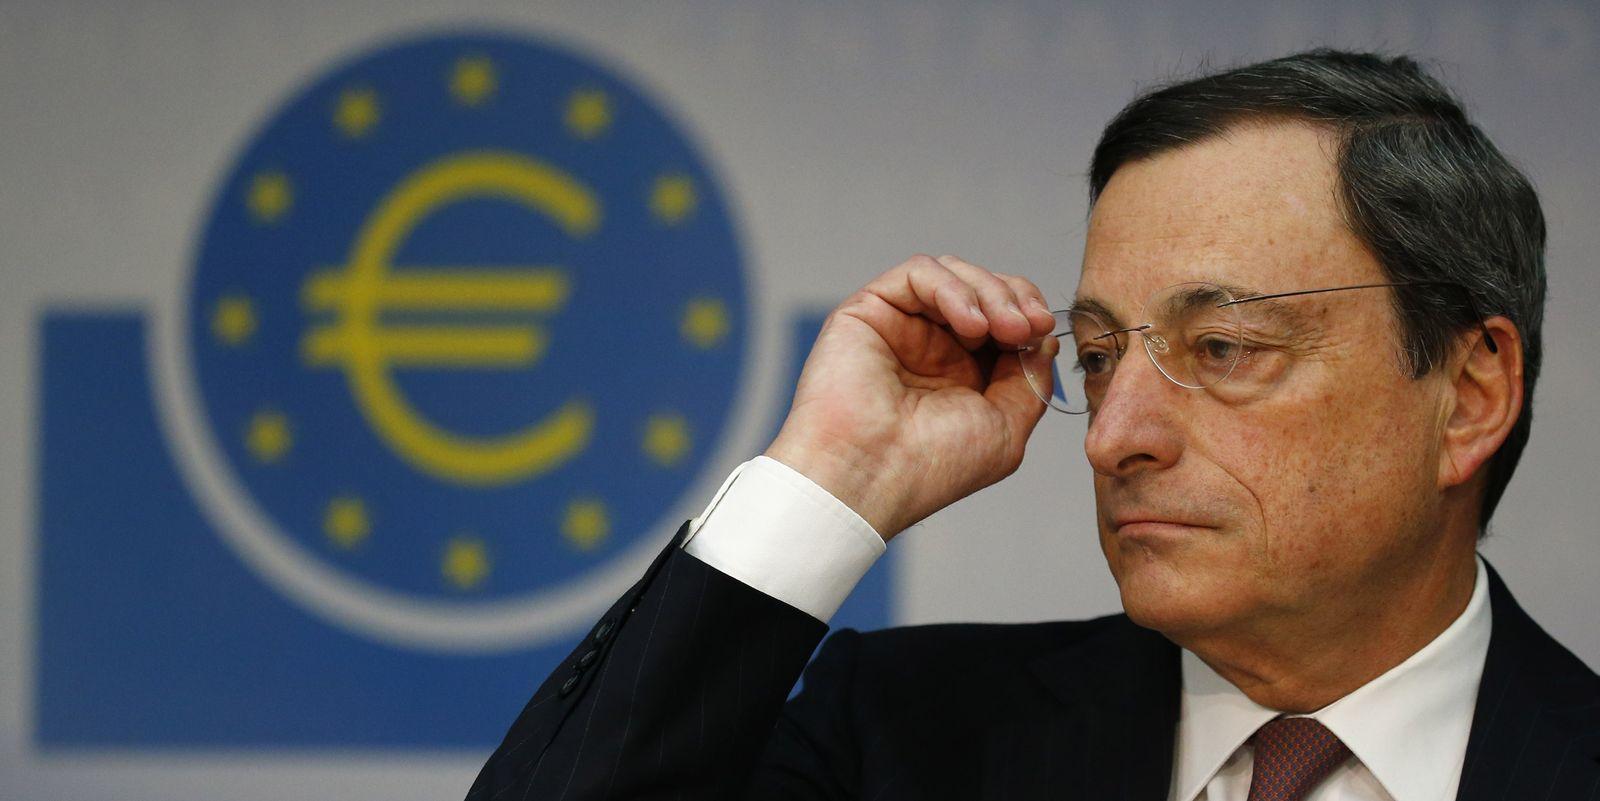 GERMANY-ECB/